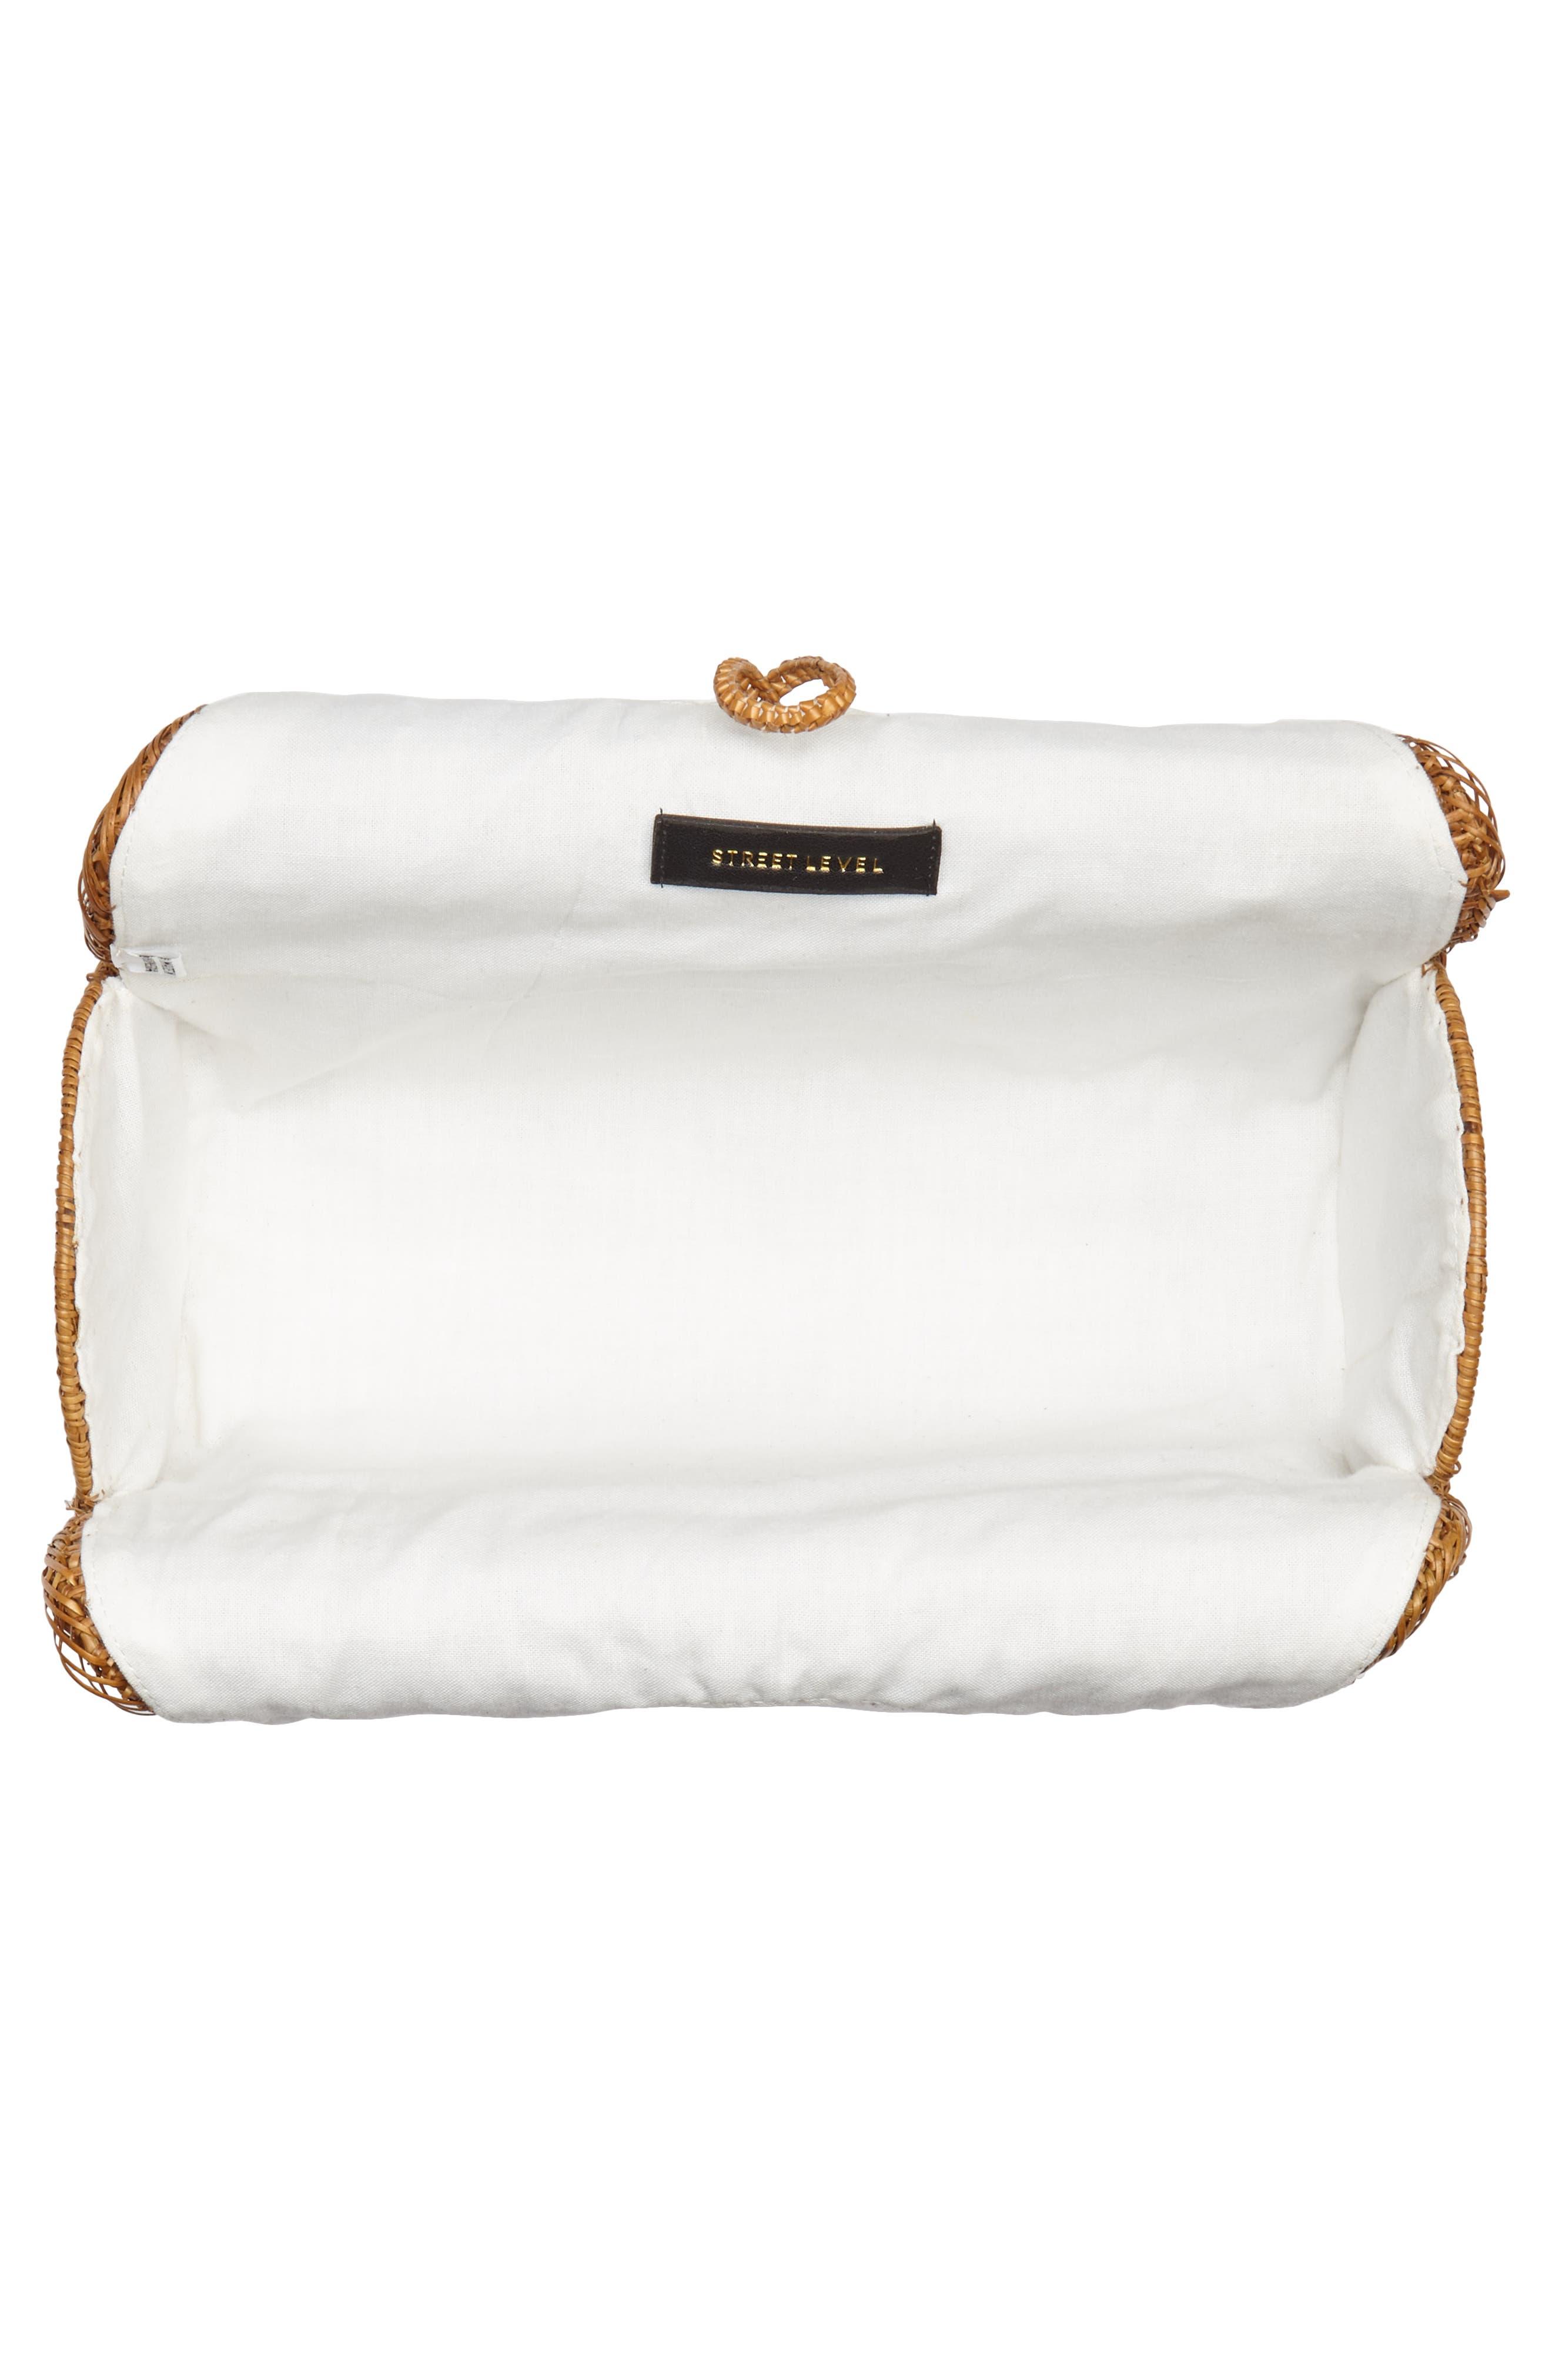 Woven Rattan Handbag,                             Alternate thumbnail 4, color,                             230